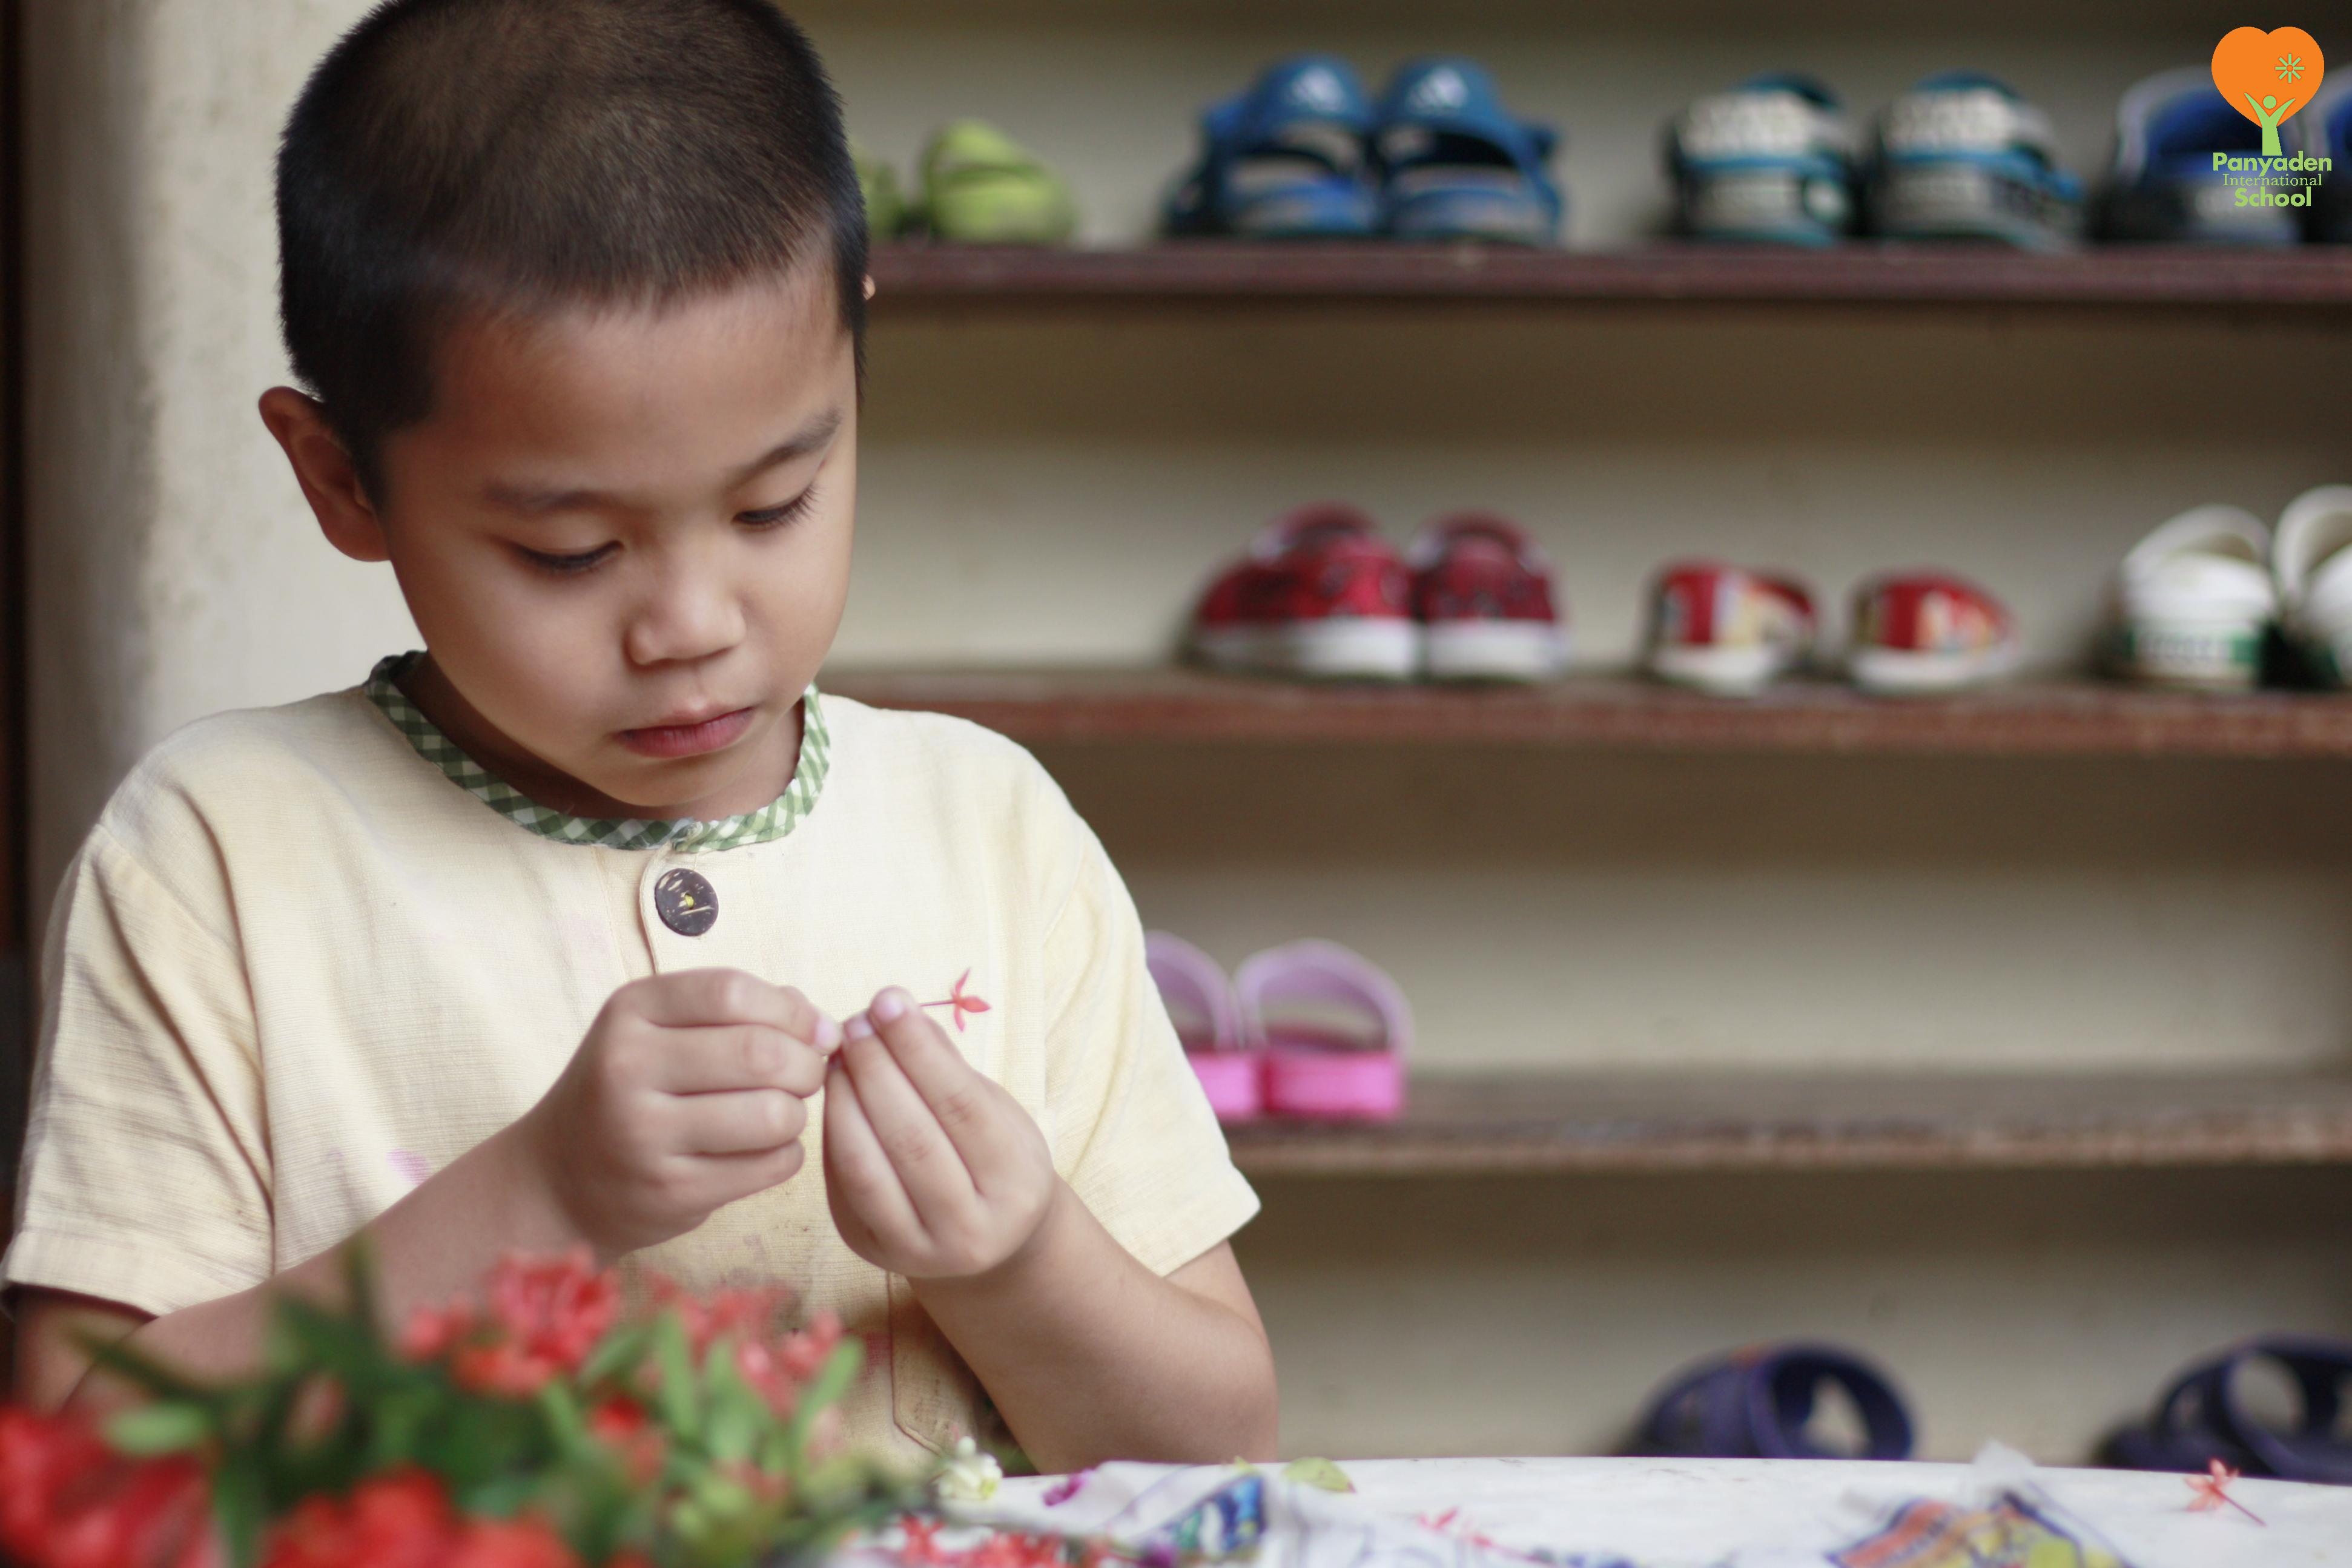 Student stringing flowers for teachers on Wai Kru Day in Thailand, Panyaden International School